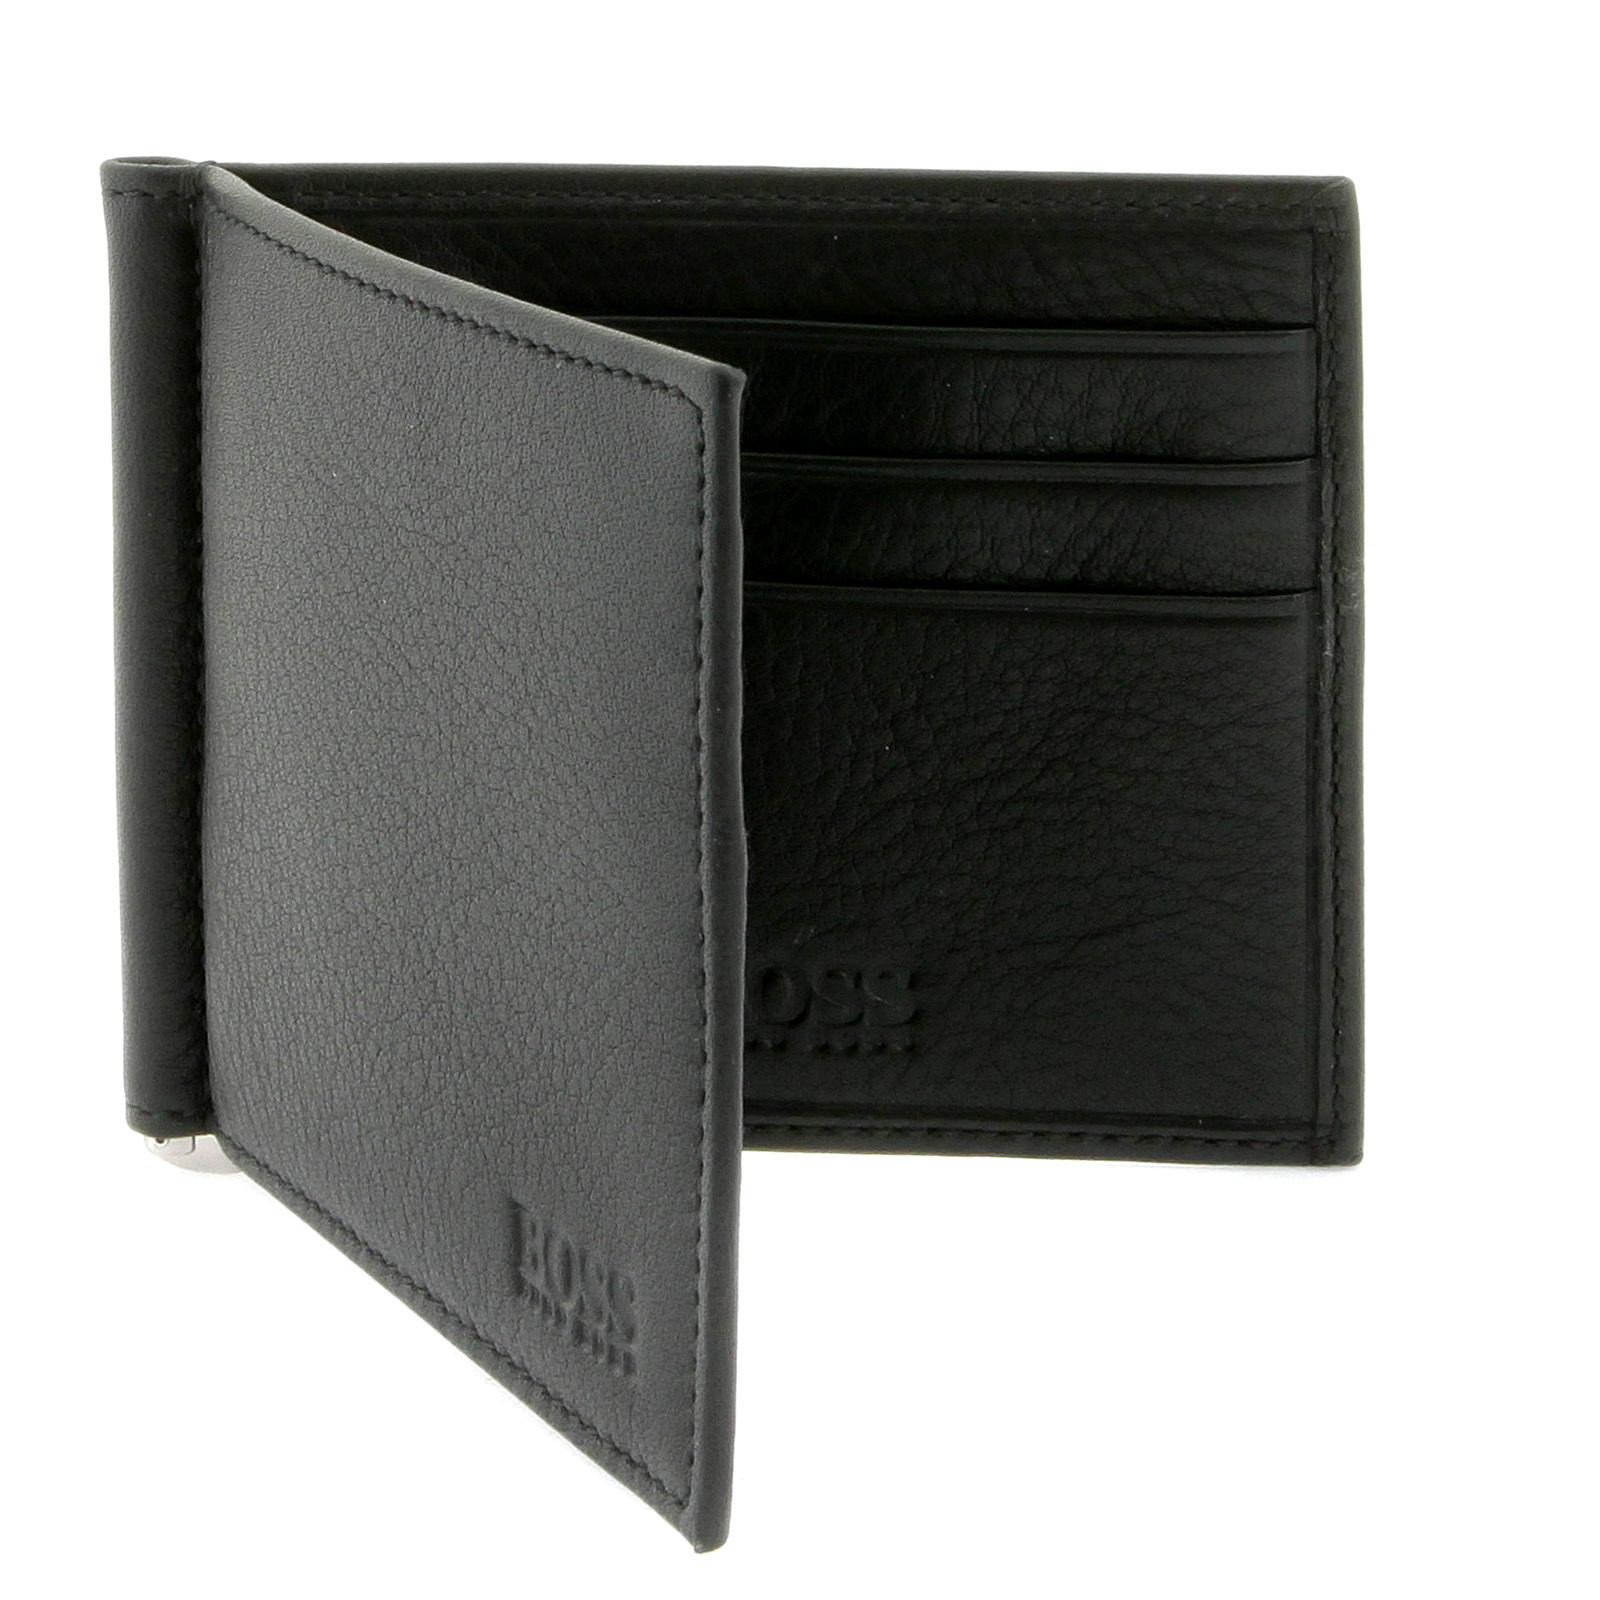 be44e83d90f Hugo Boss Wallet Gladiator credit card wallet and key holder gift set  50184328 BOSS1693